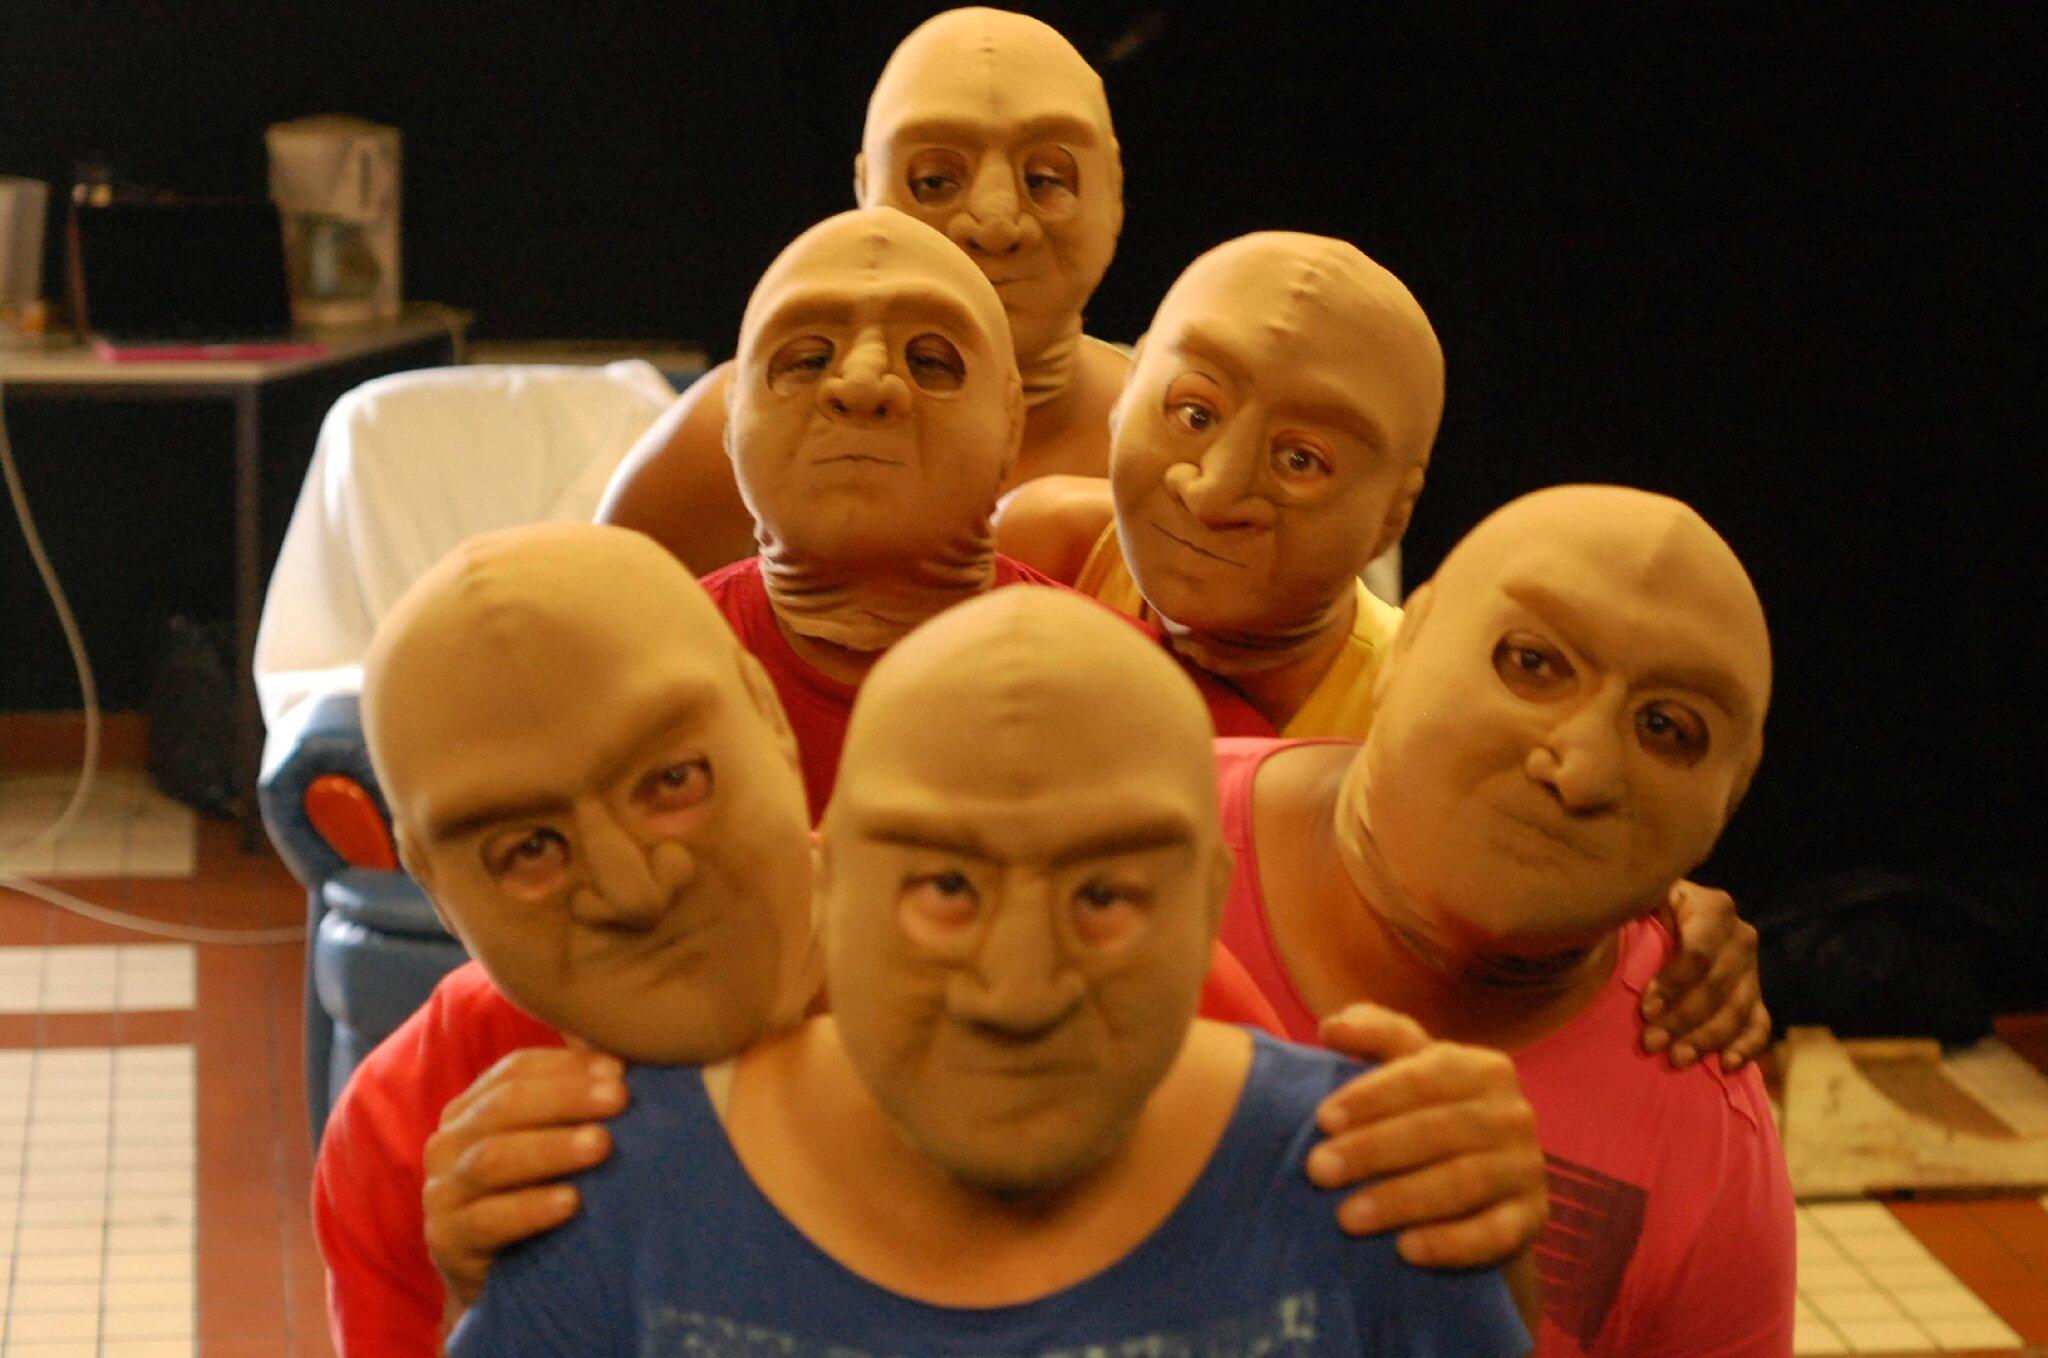 Masques de travail